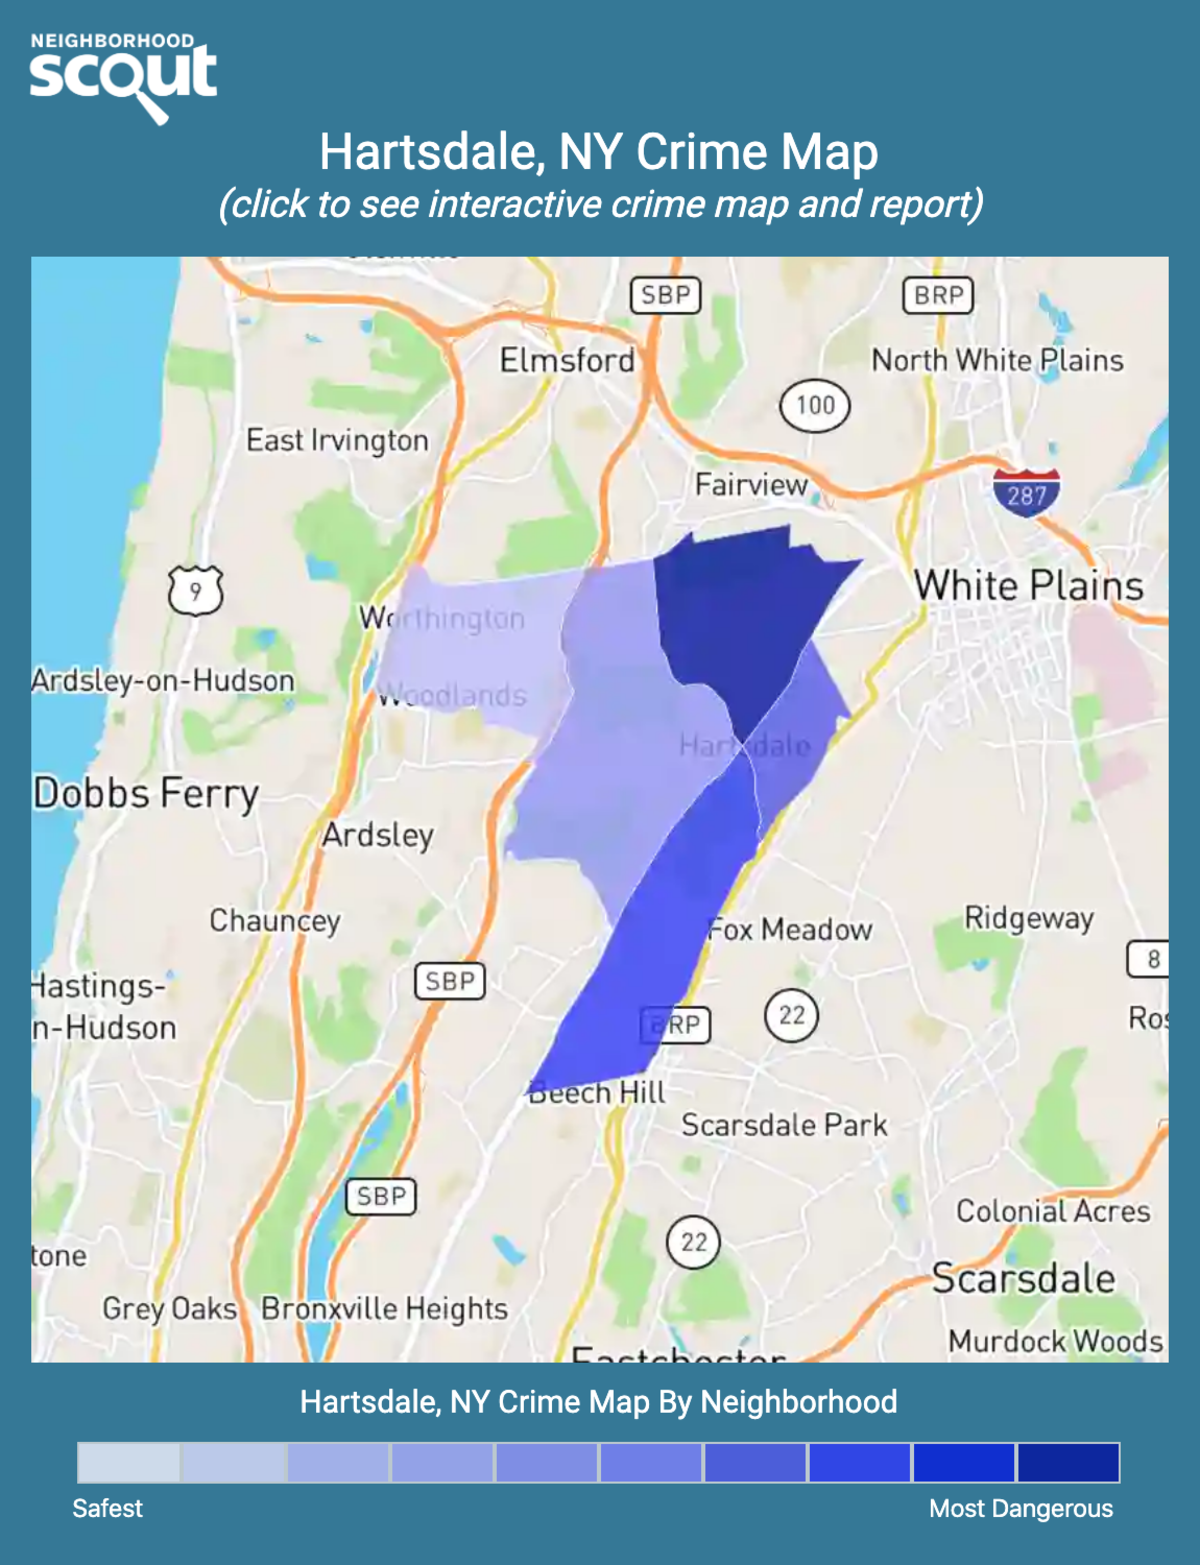 Hartsdale, New York crime map